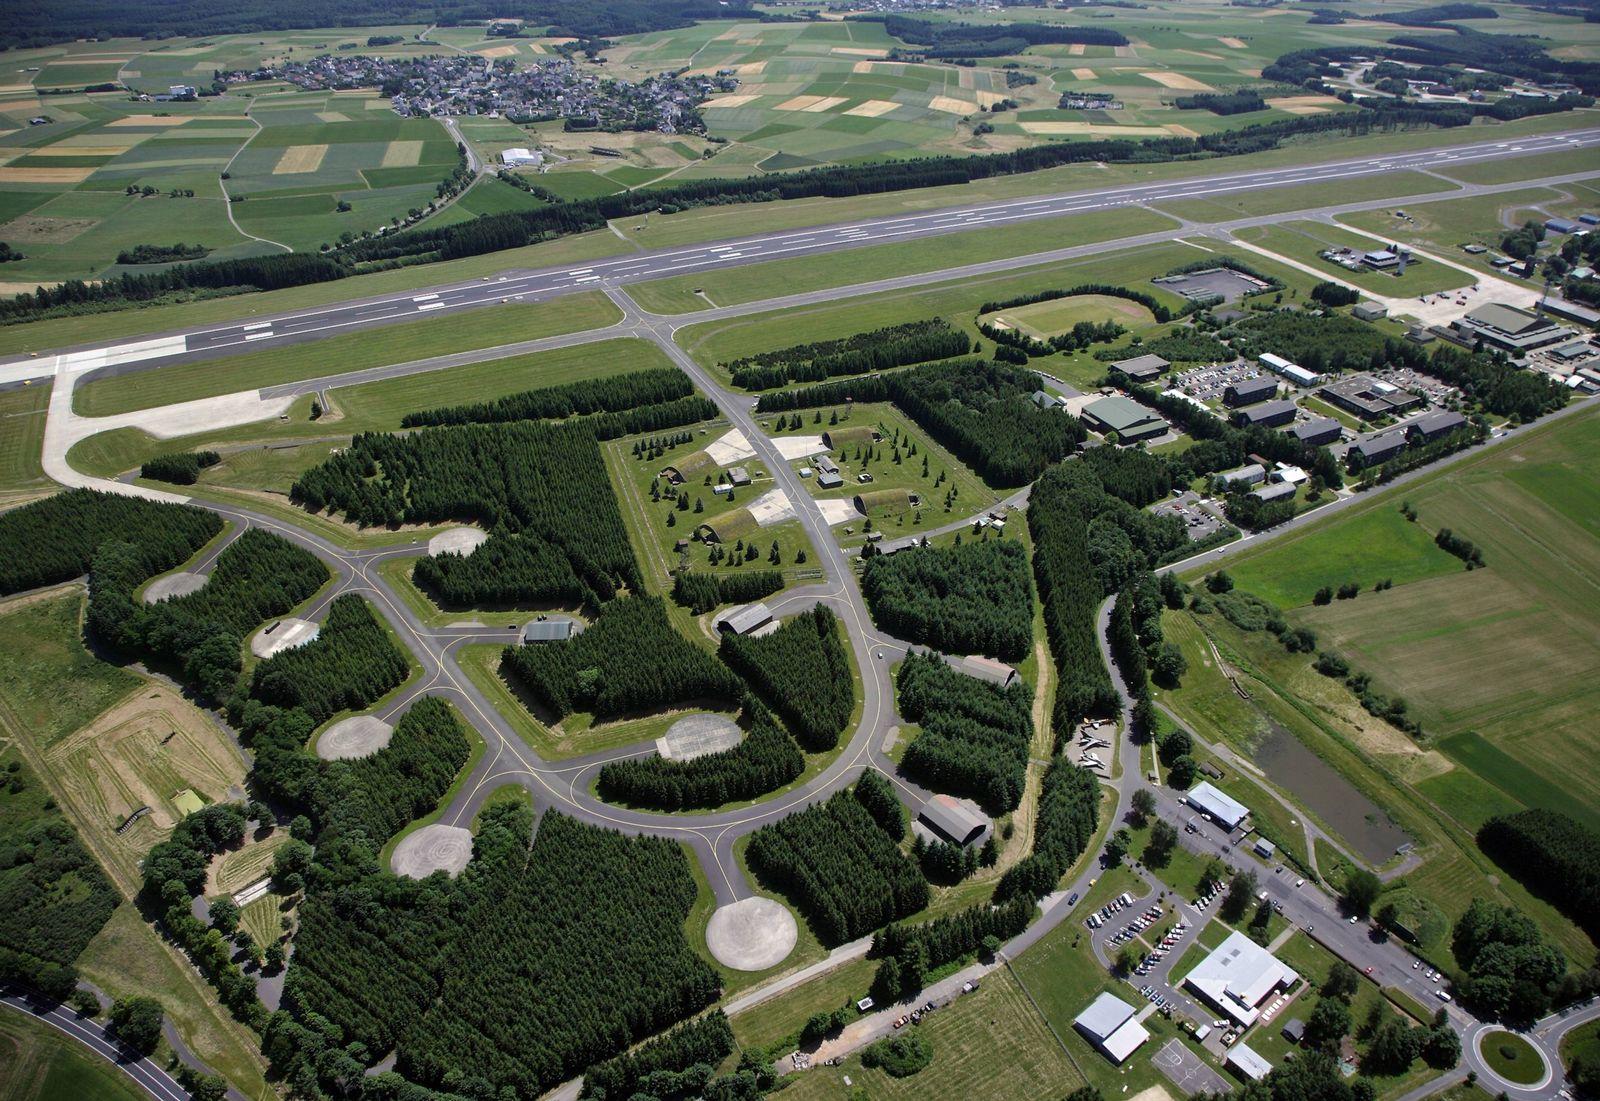 Fliegerhorst/ Büchel